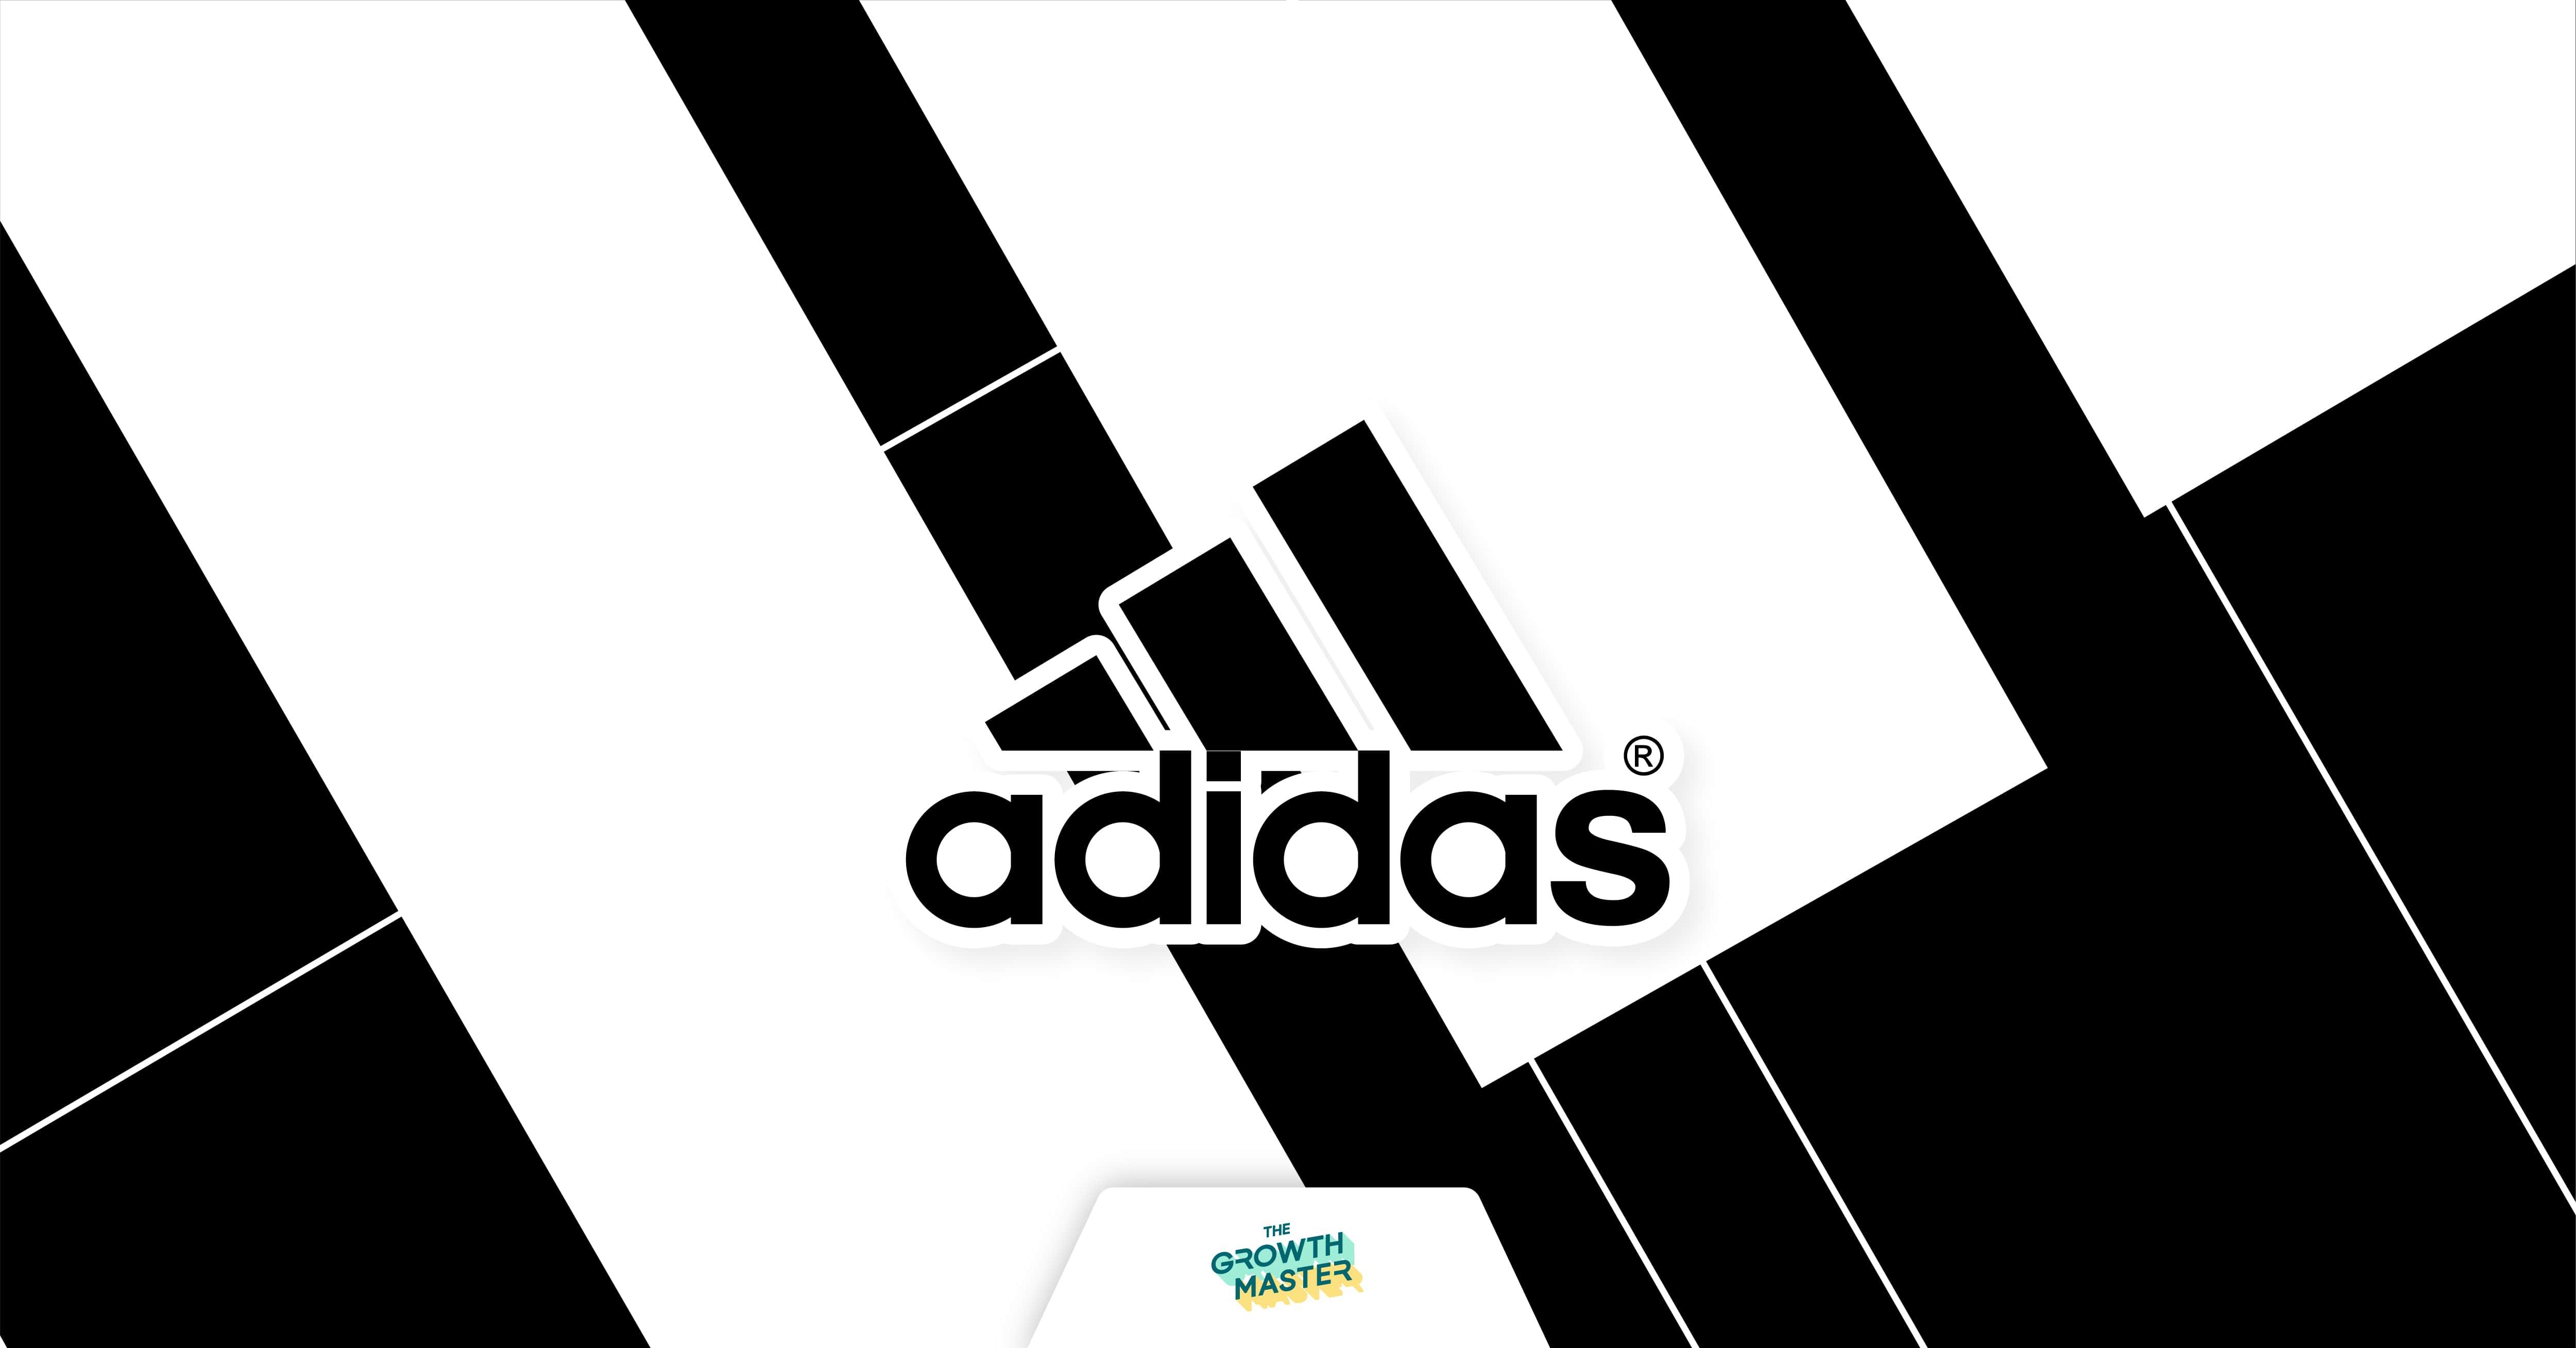 CASE STUDY : Adidas แบรนด์ที่เป็นมากกว่าแค่อุปกรณ์กีฬาเบอร์ต้น ๆ ของโลก